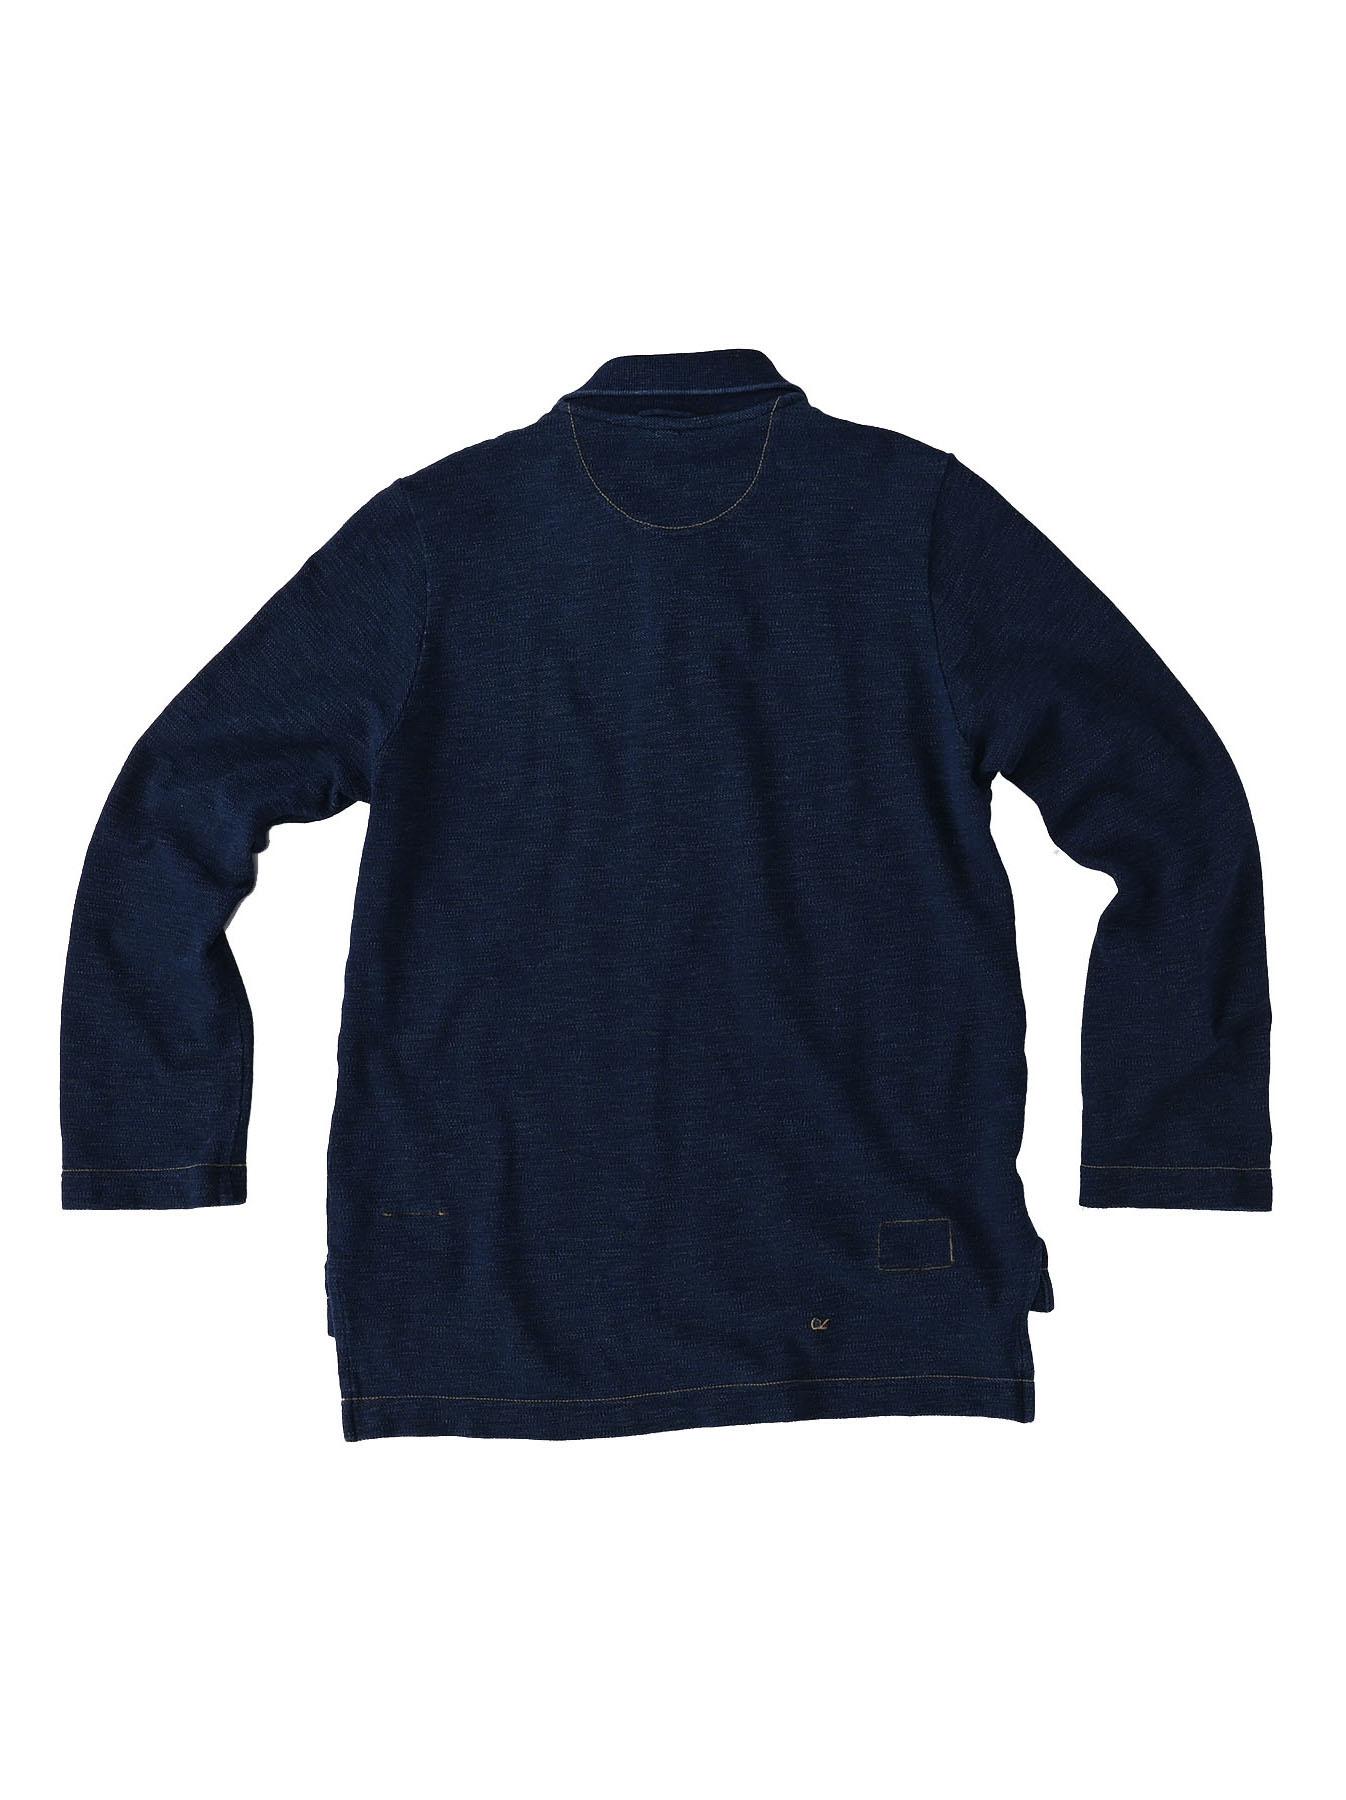 Indigo Kanoko Shiokaze Long-sleeved Square Polo Shirt (0521)-5